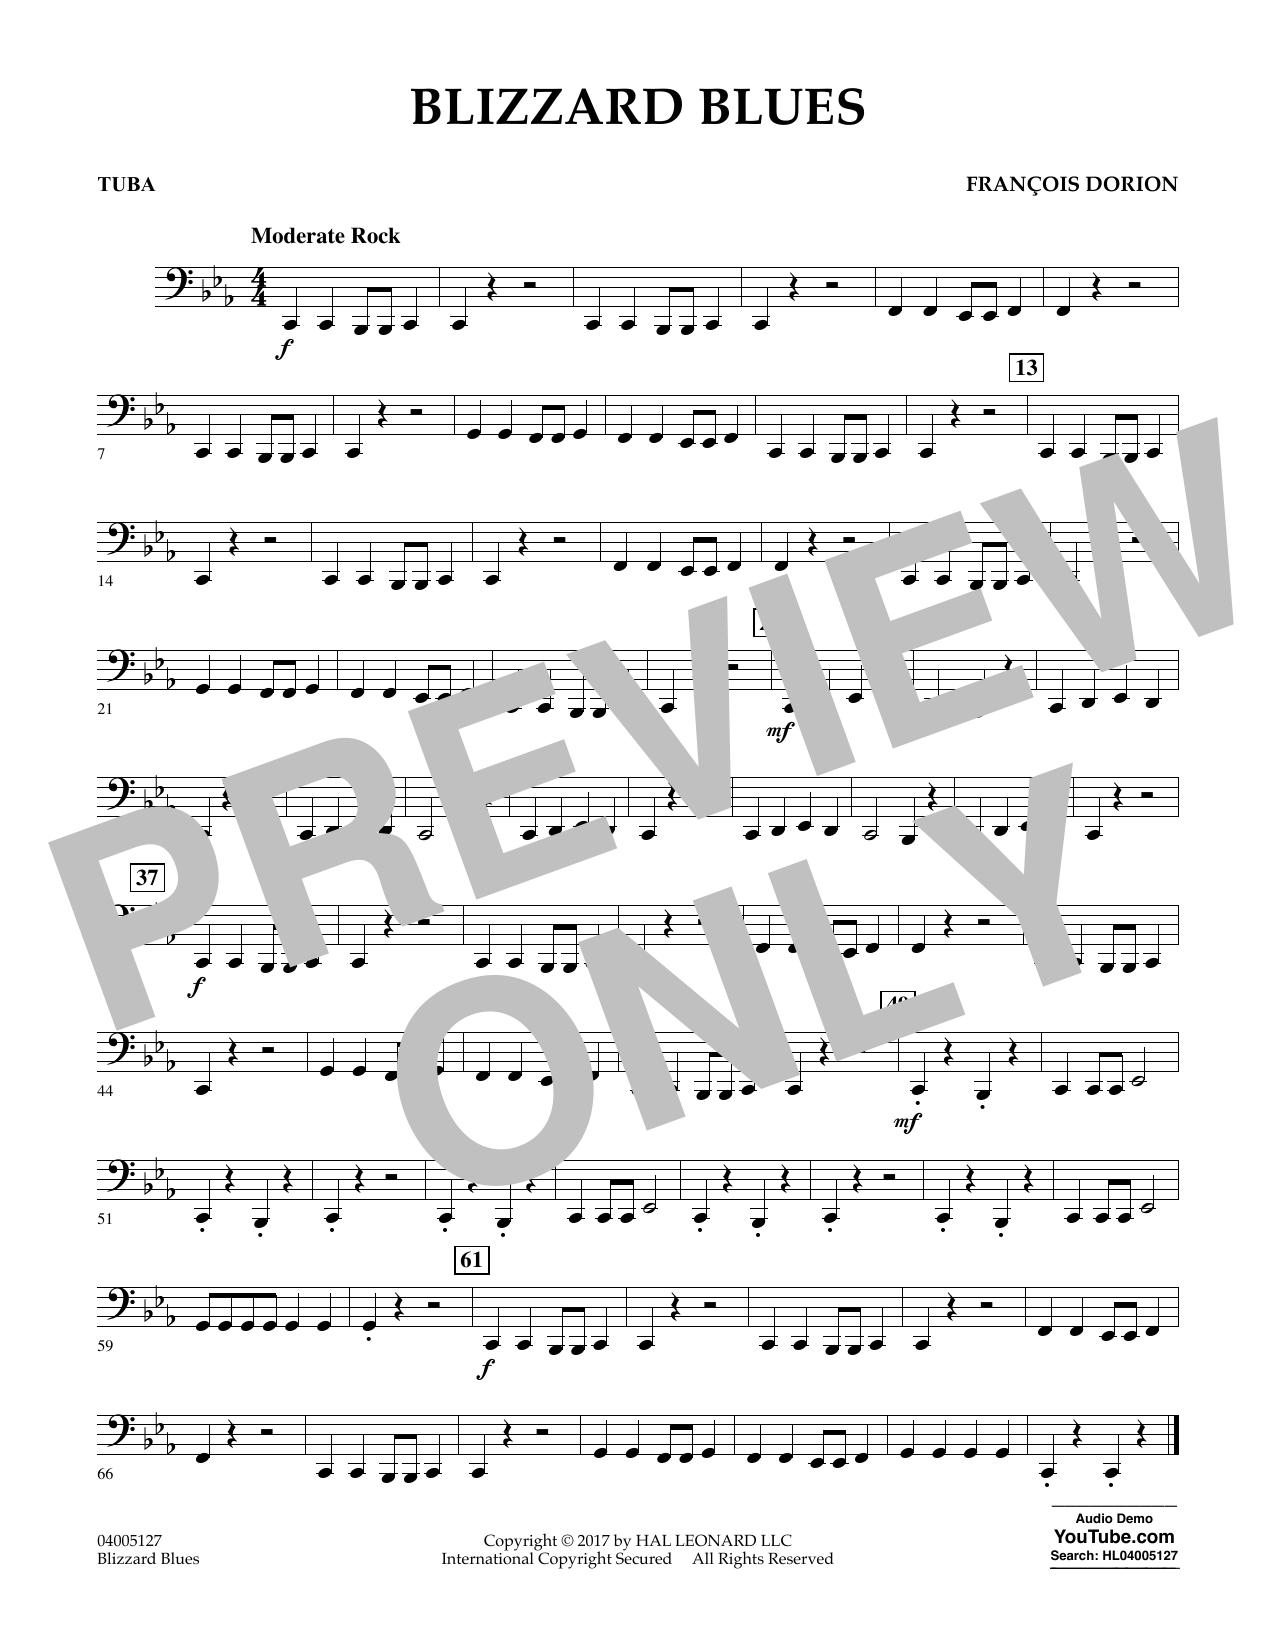 Francois Dorion Blizzard Blues - Tuba sheet music notes and chords. Download Printable PDF.